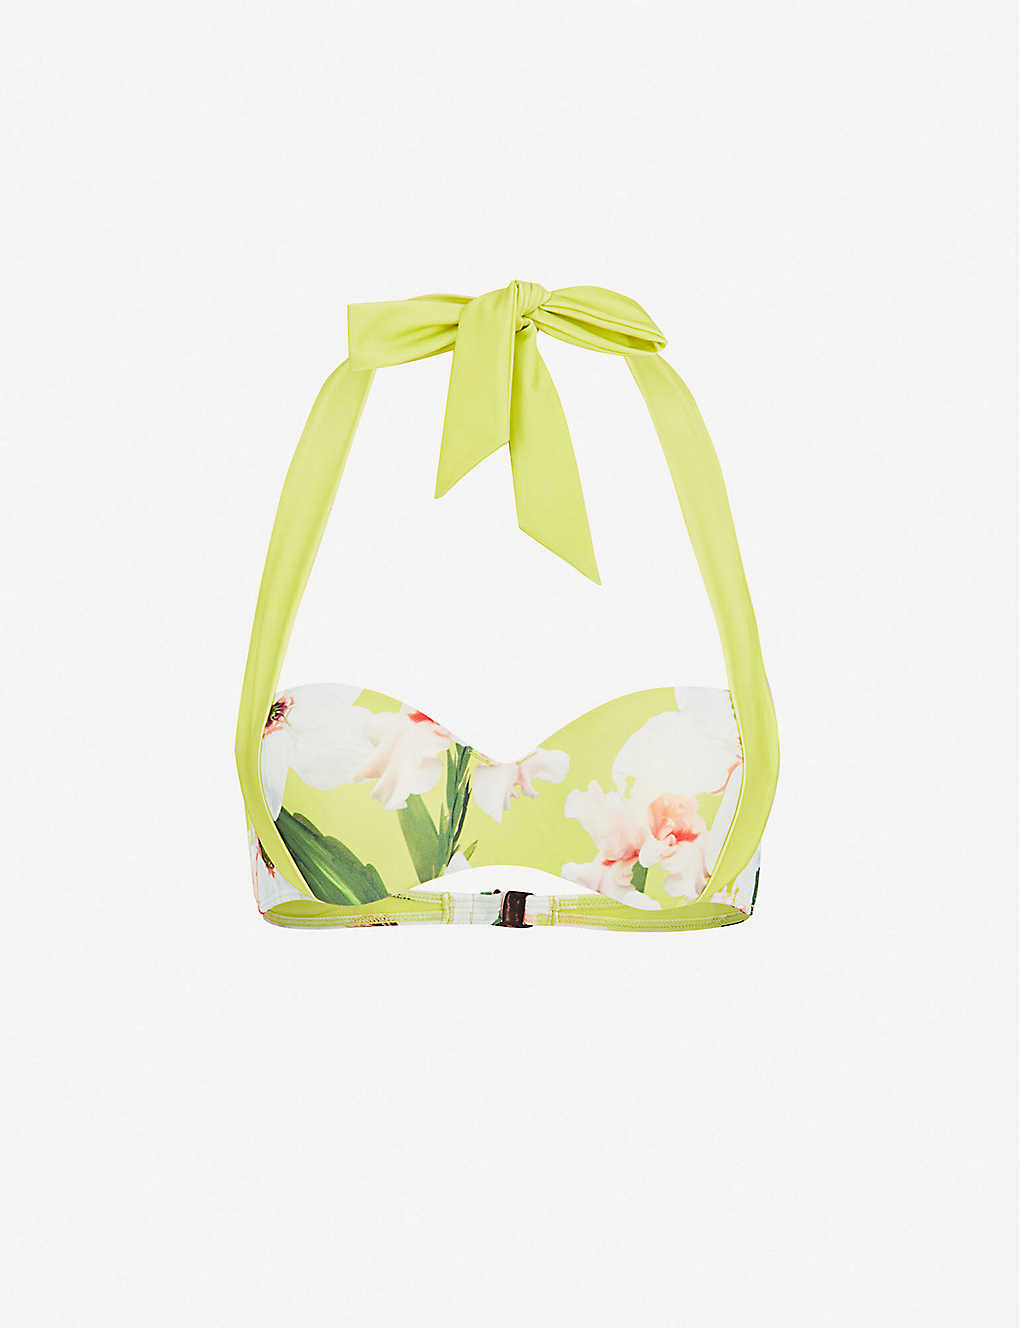 307c878f33d TED BAKER - Chatsworth Bloom floral-print bikini top | Selfridges.com